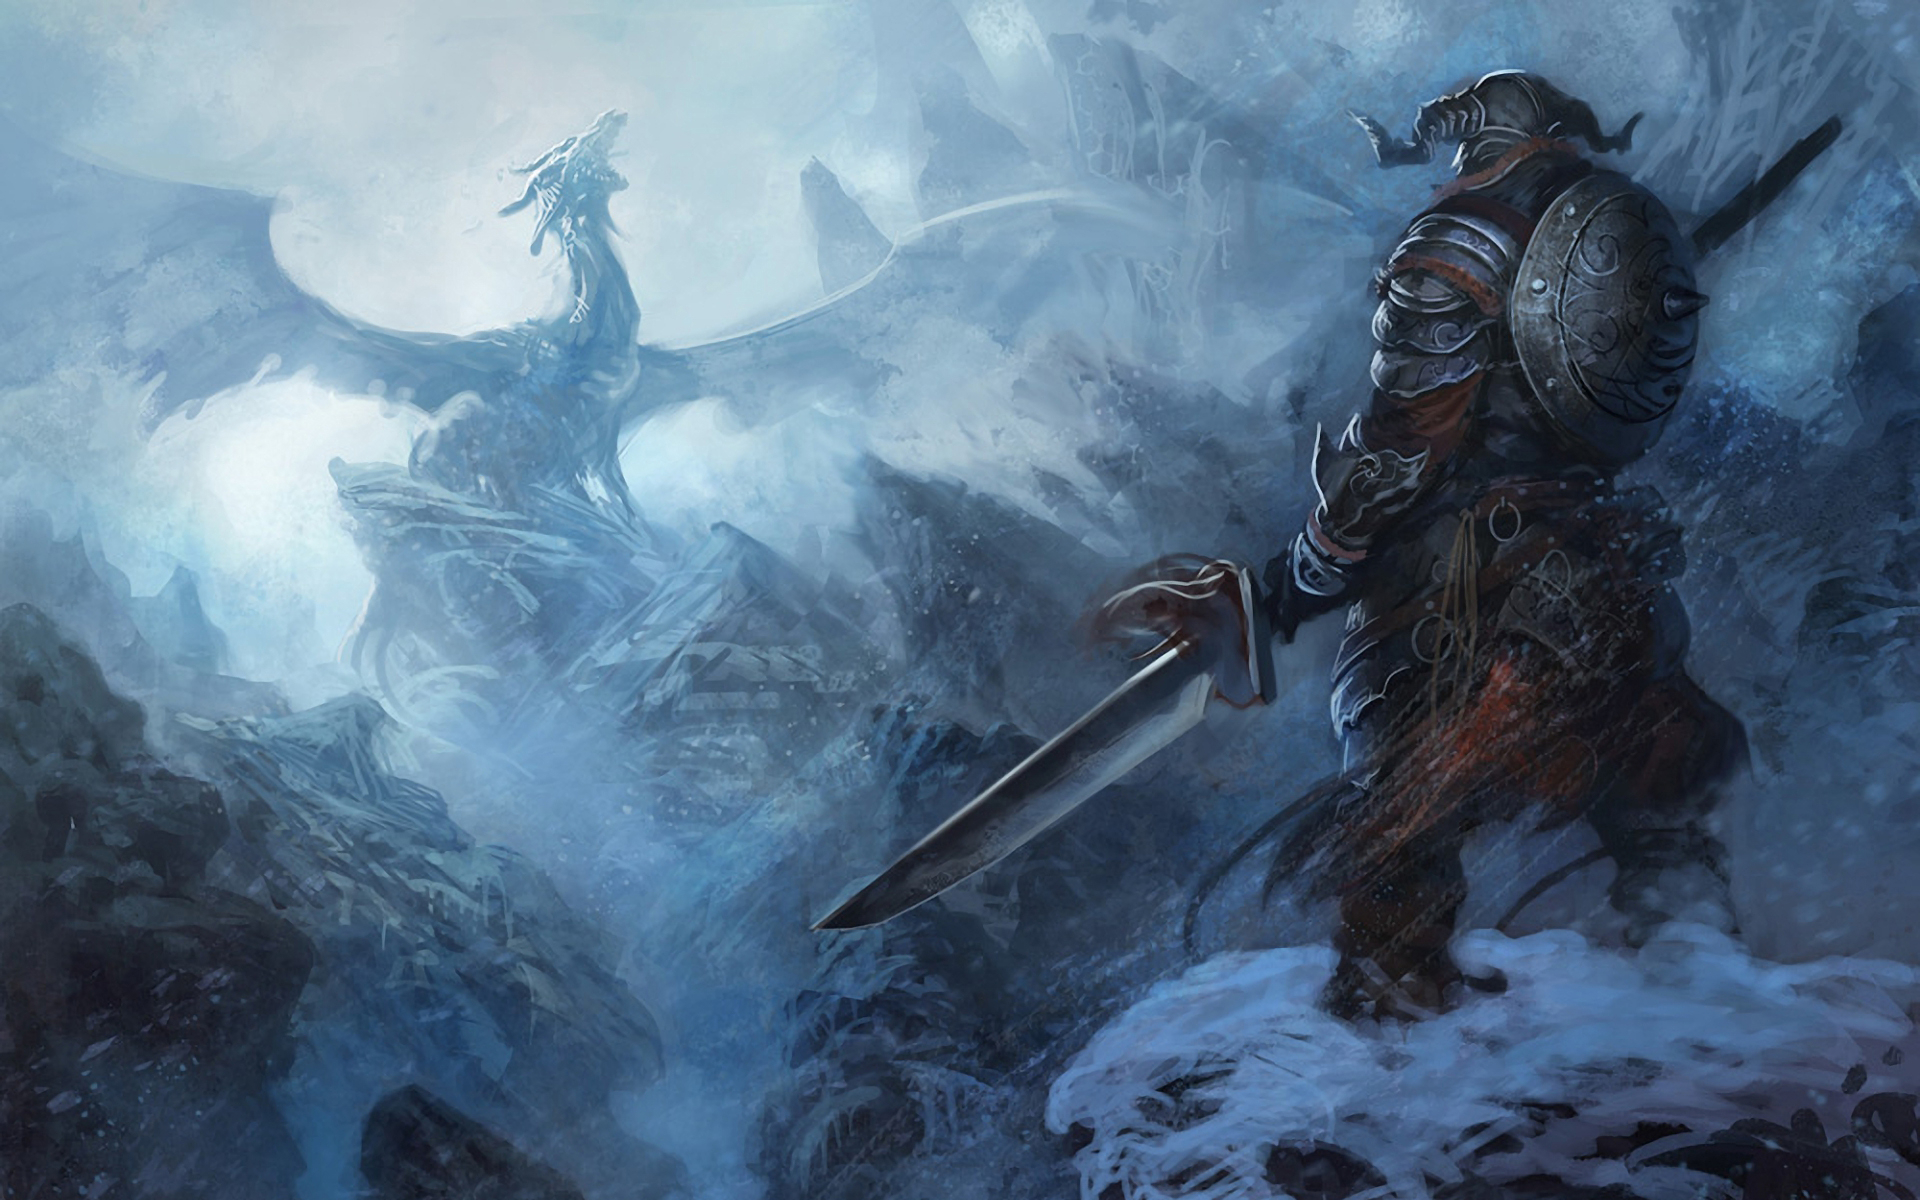 Drawn wallpaper skyrim Skyrim Dragon Dragon wallpaper Armor